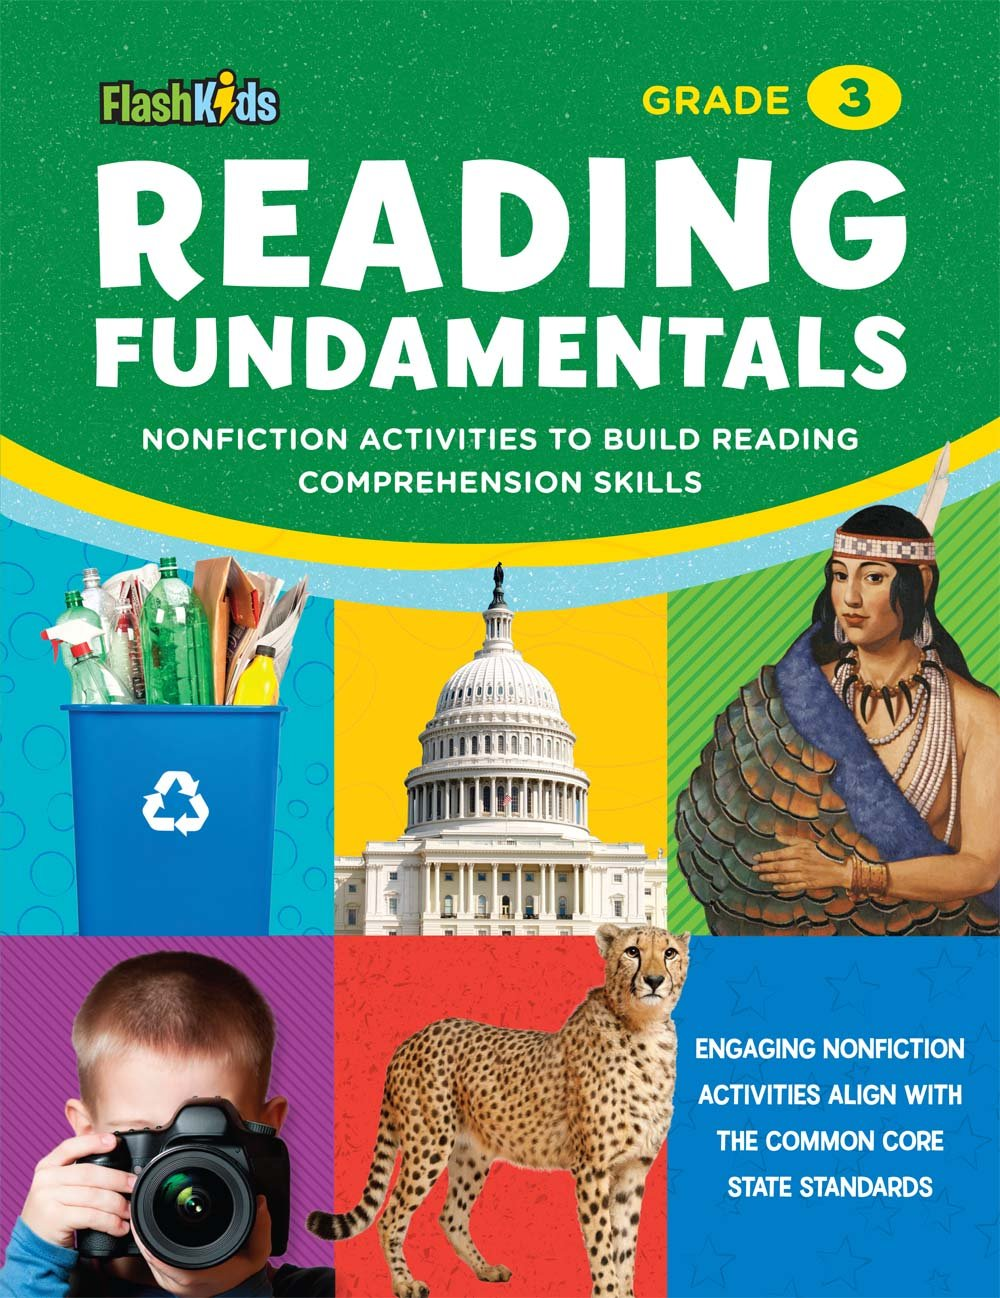 Reading Fundamentals: Grade 3: Nonfiction Activities to Build Reading Comprehension Skills (Flash Kids Fundamentals) PDF